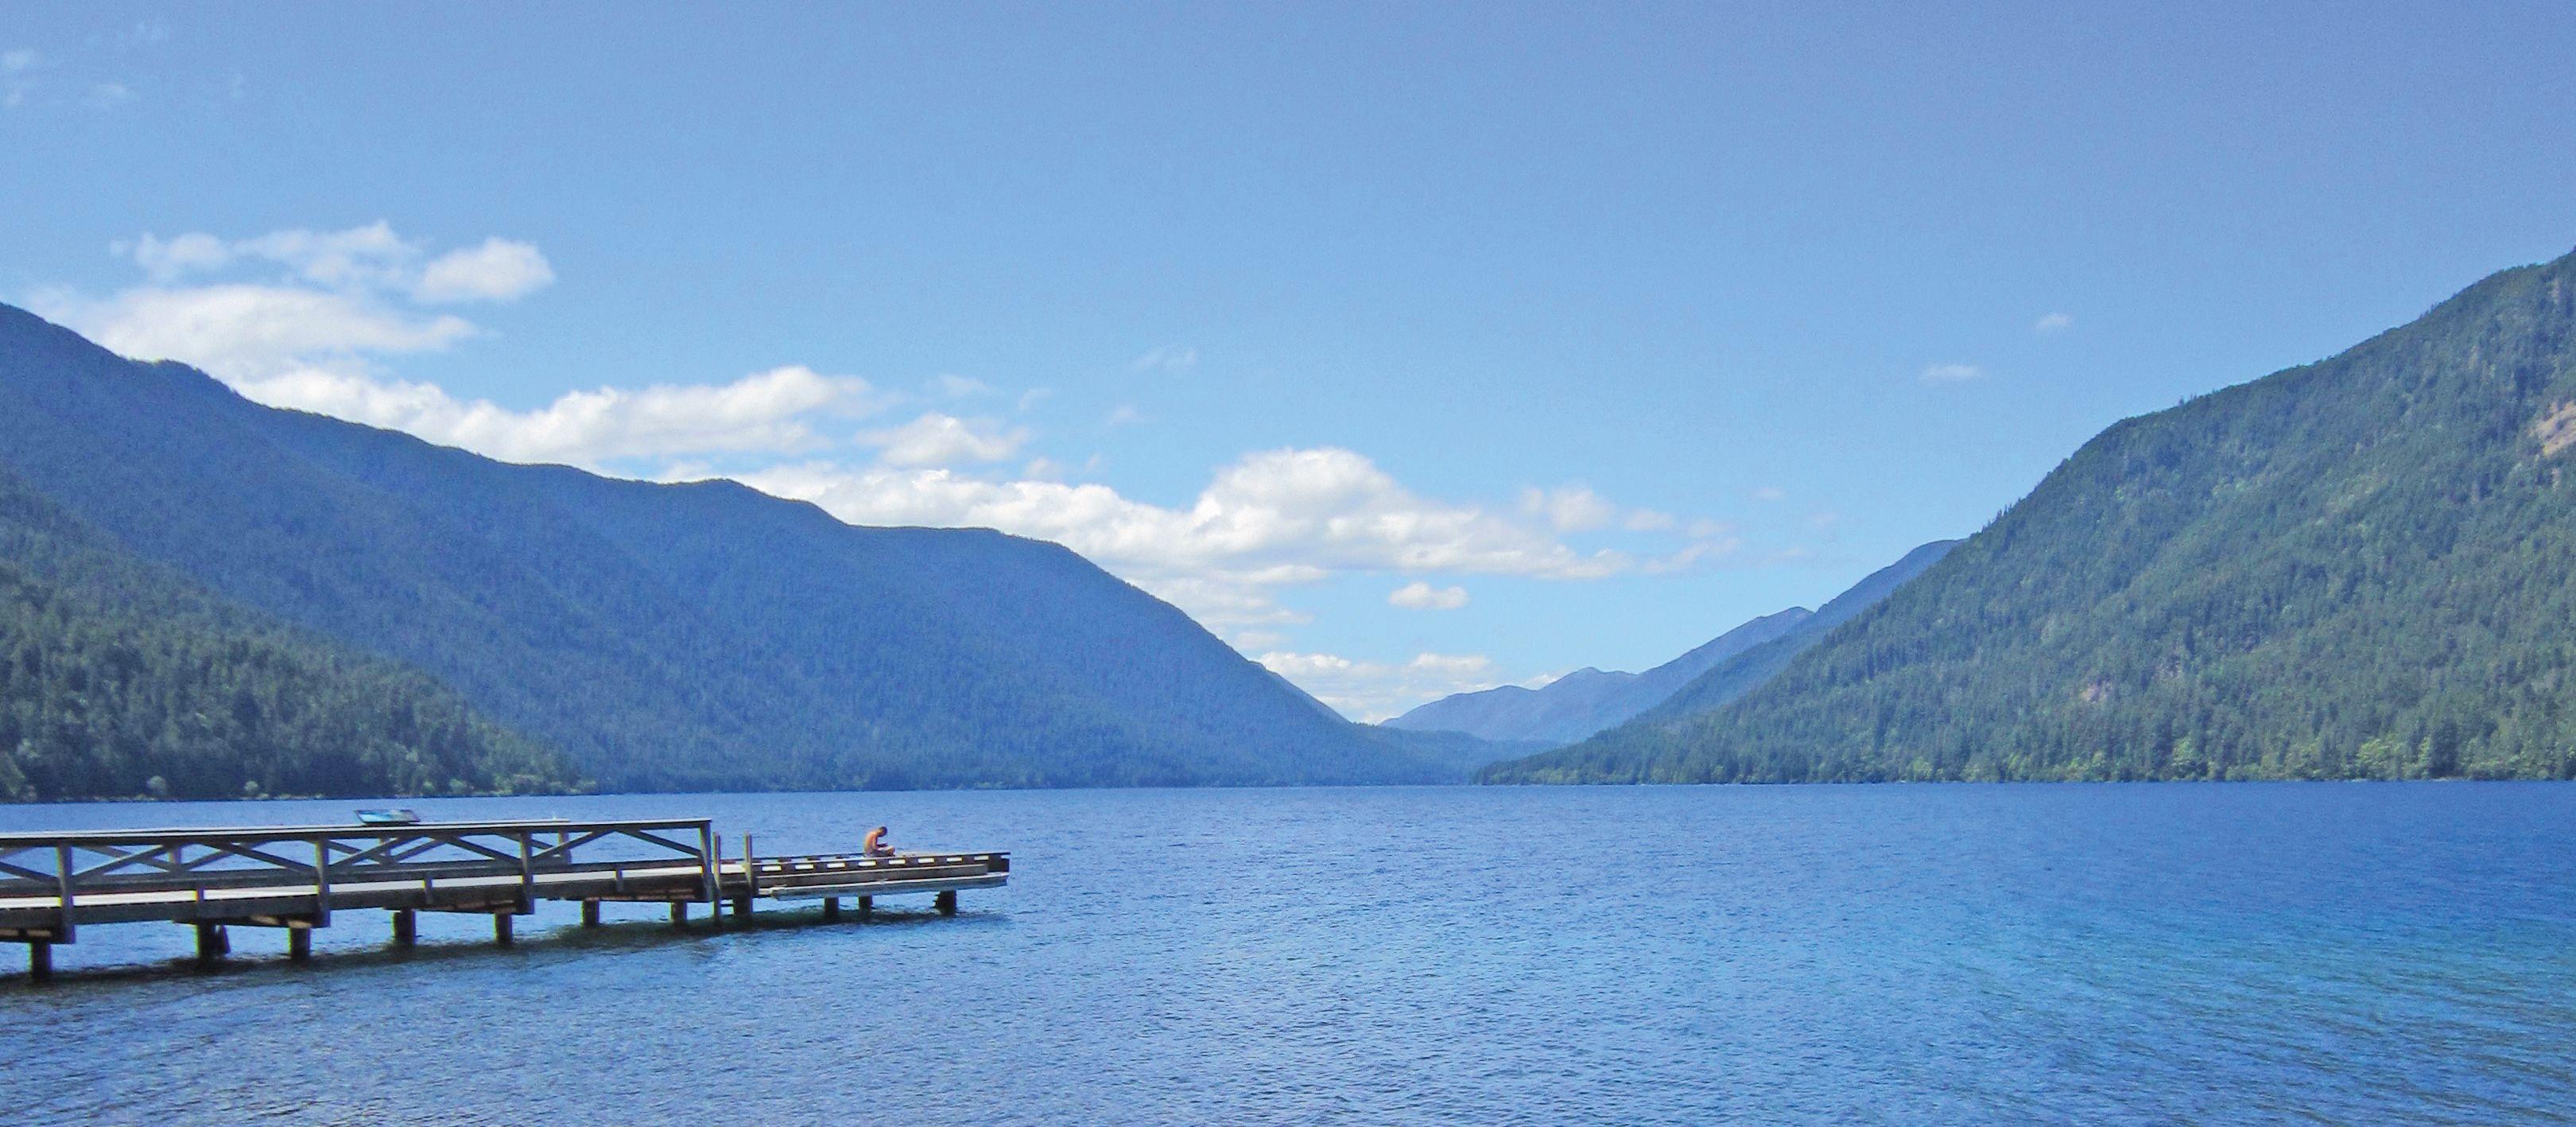 Lake Crescent Kanus am See